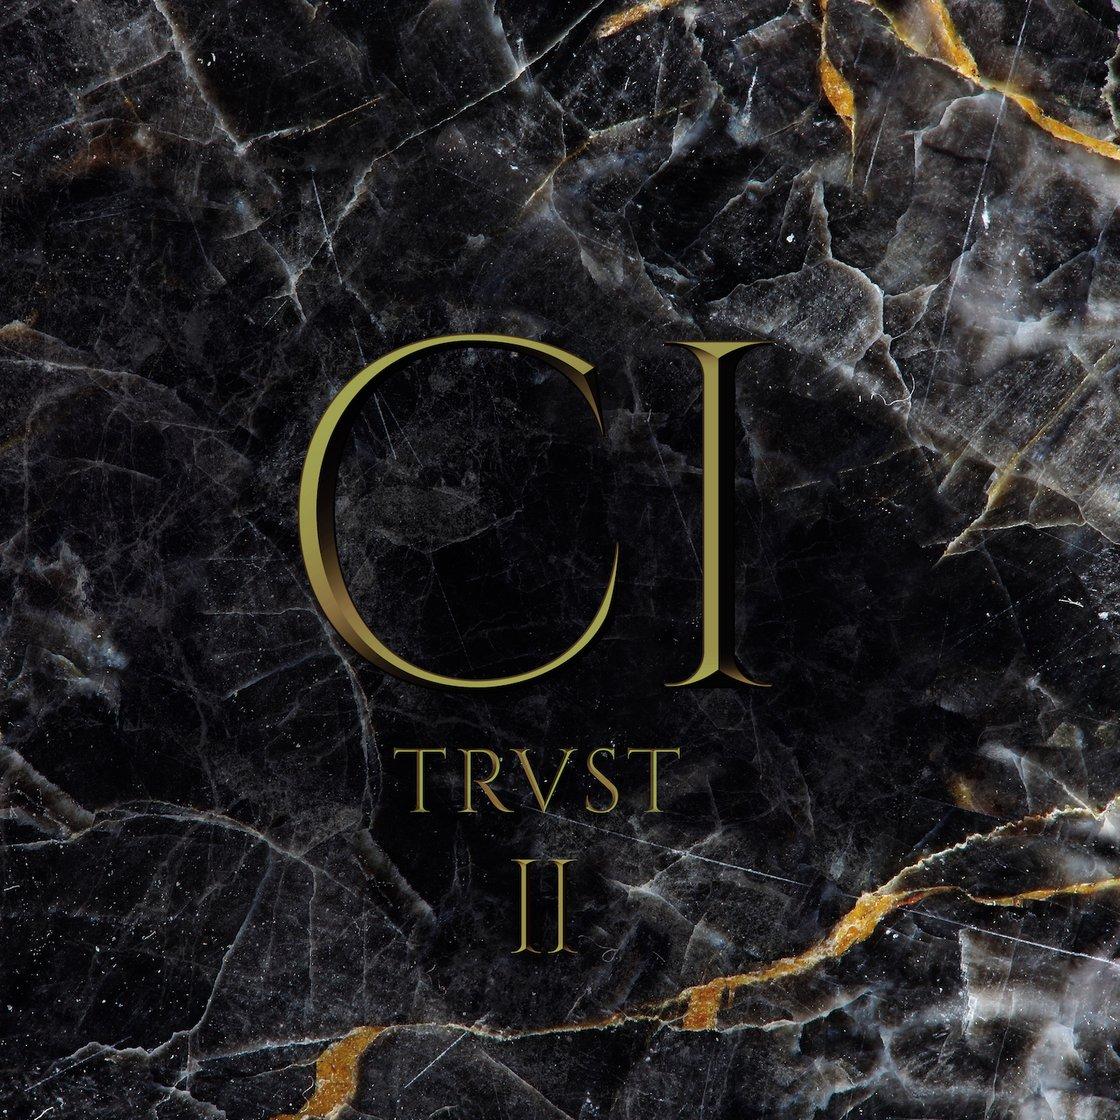 Image of TRUST - RE.CI.DIV - Session II (Répression) - CD+DVD Digipack